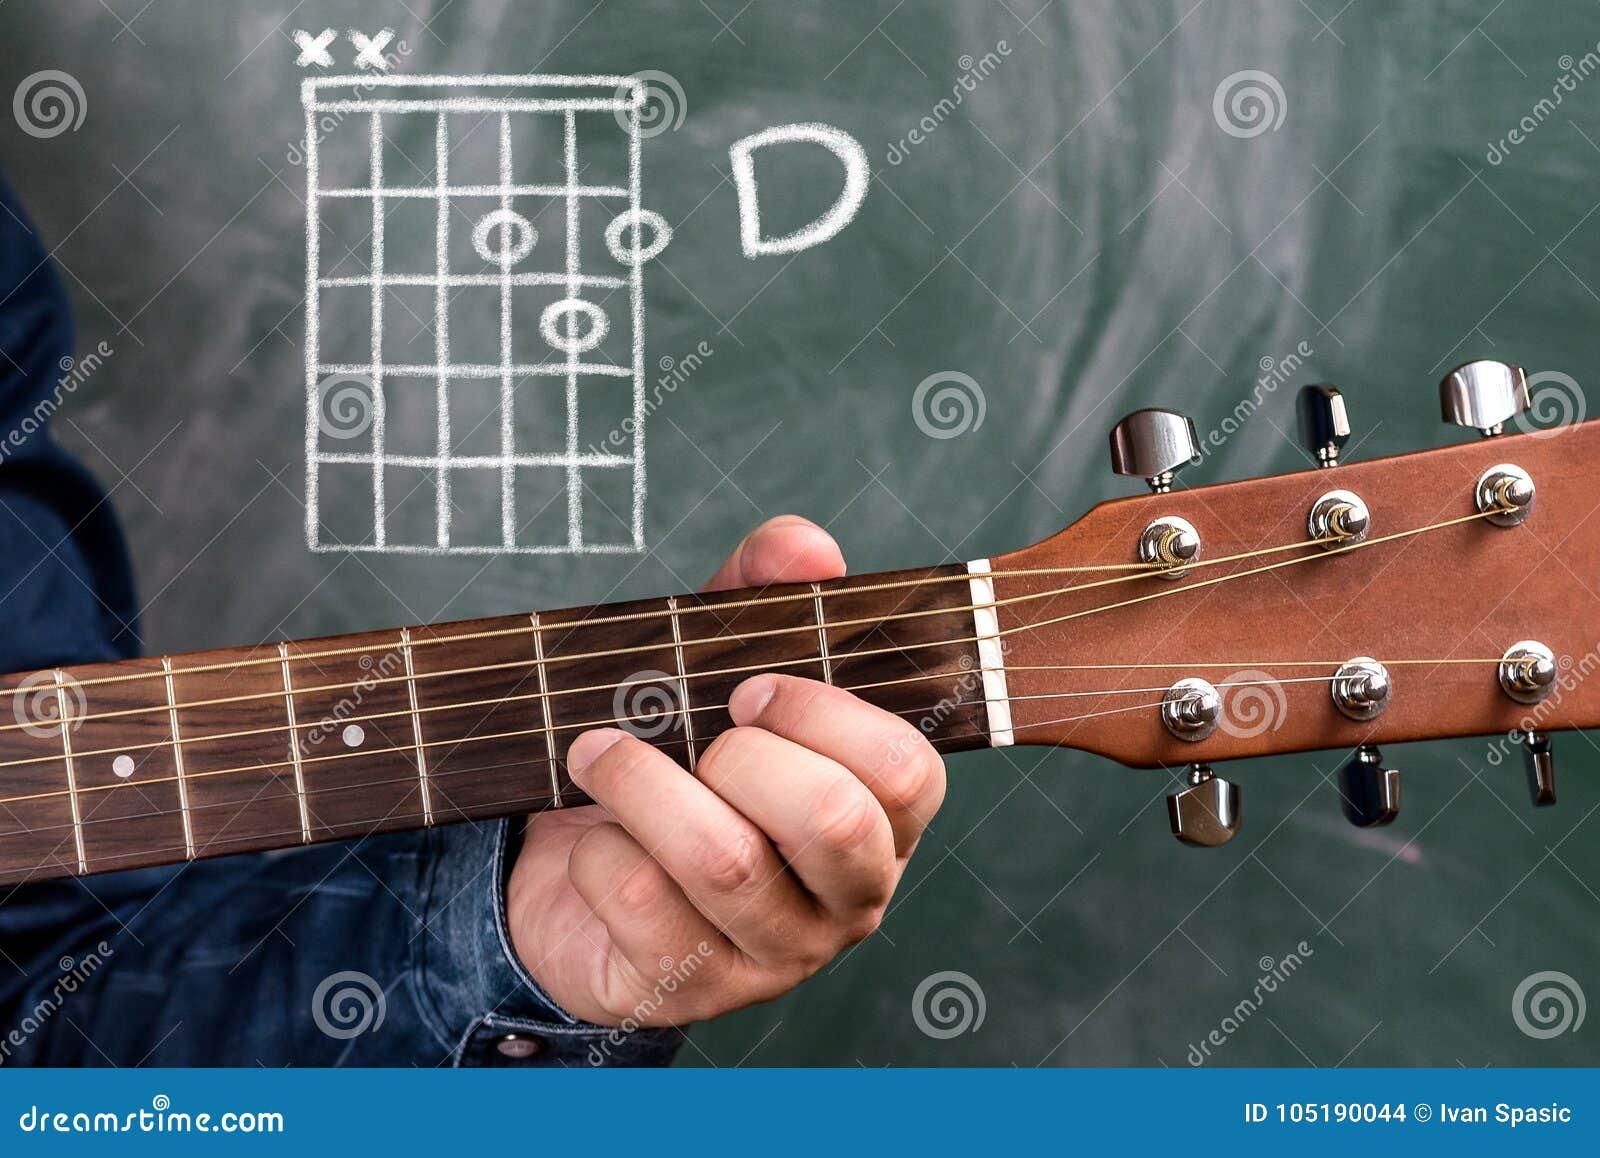 Man Playing Guitar Chords Displayed On A Blackboard Chord D Stock